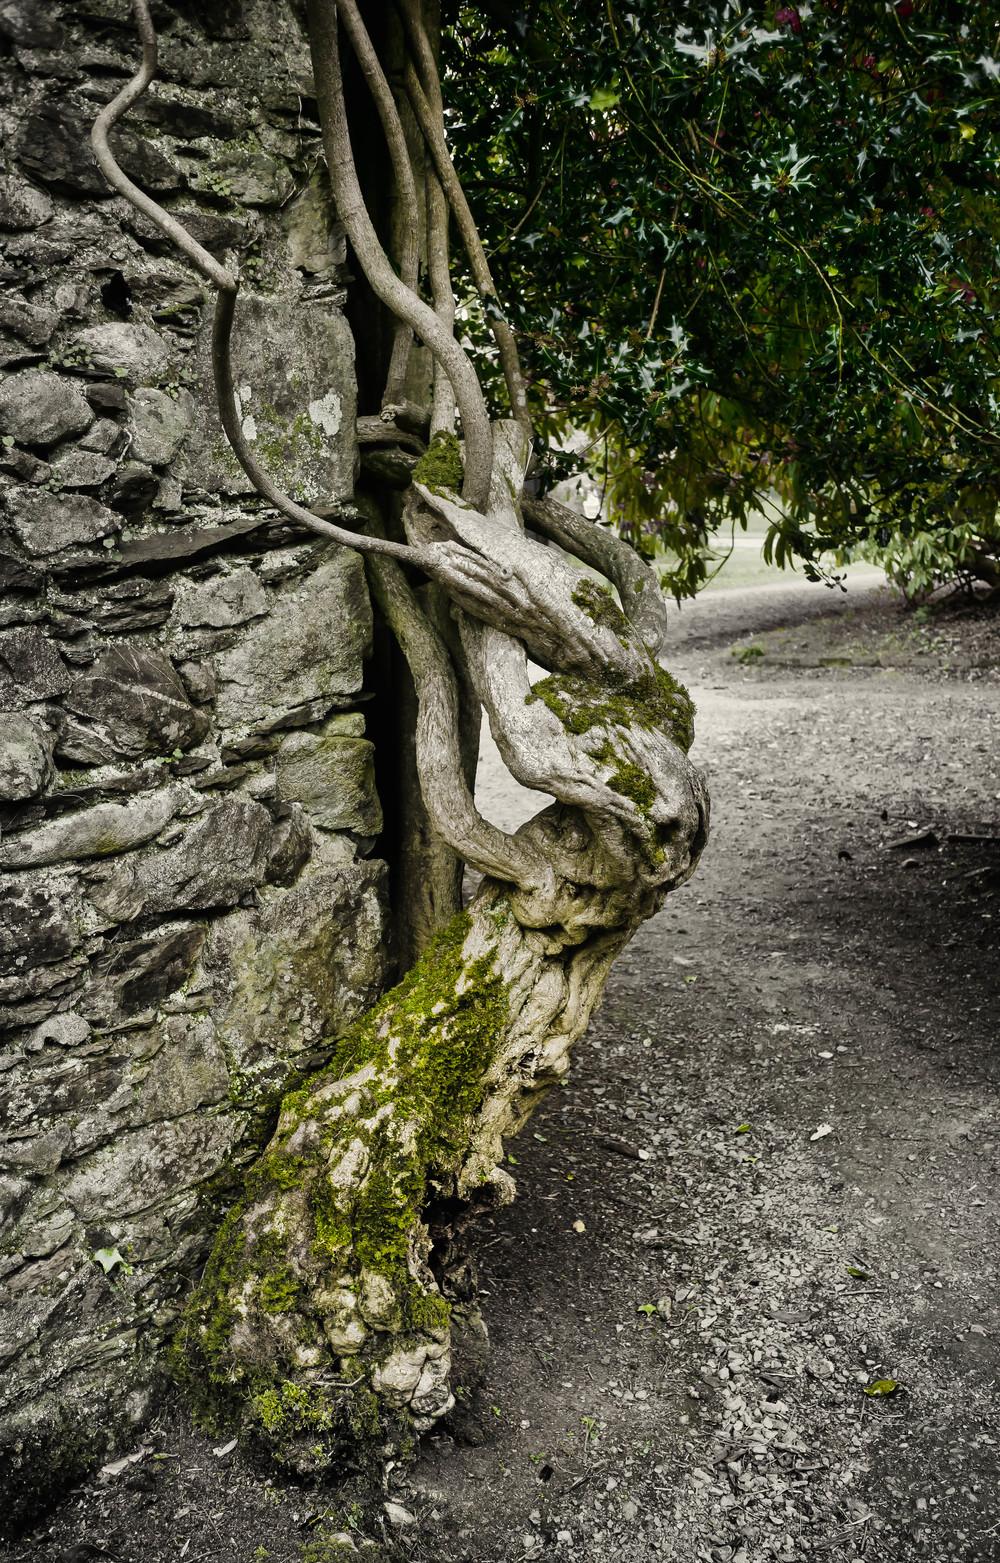 Kilmacurragh Arboretum May 2016 14 Tree and Wall  (1 of 1).jpg